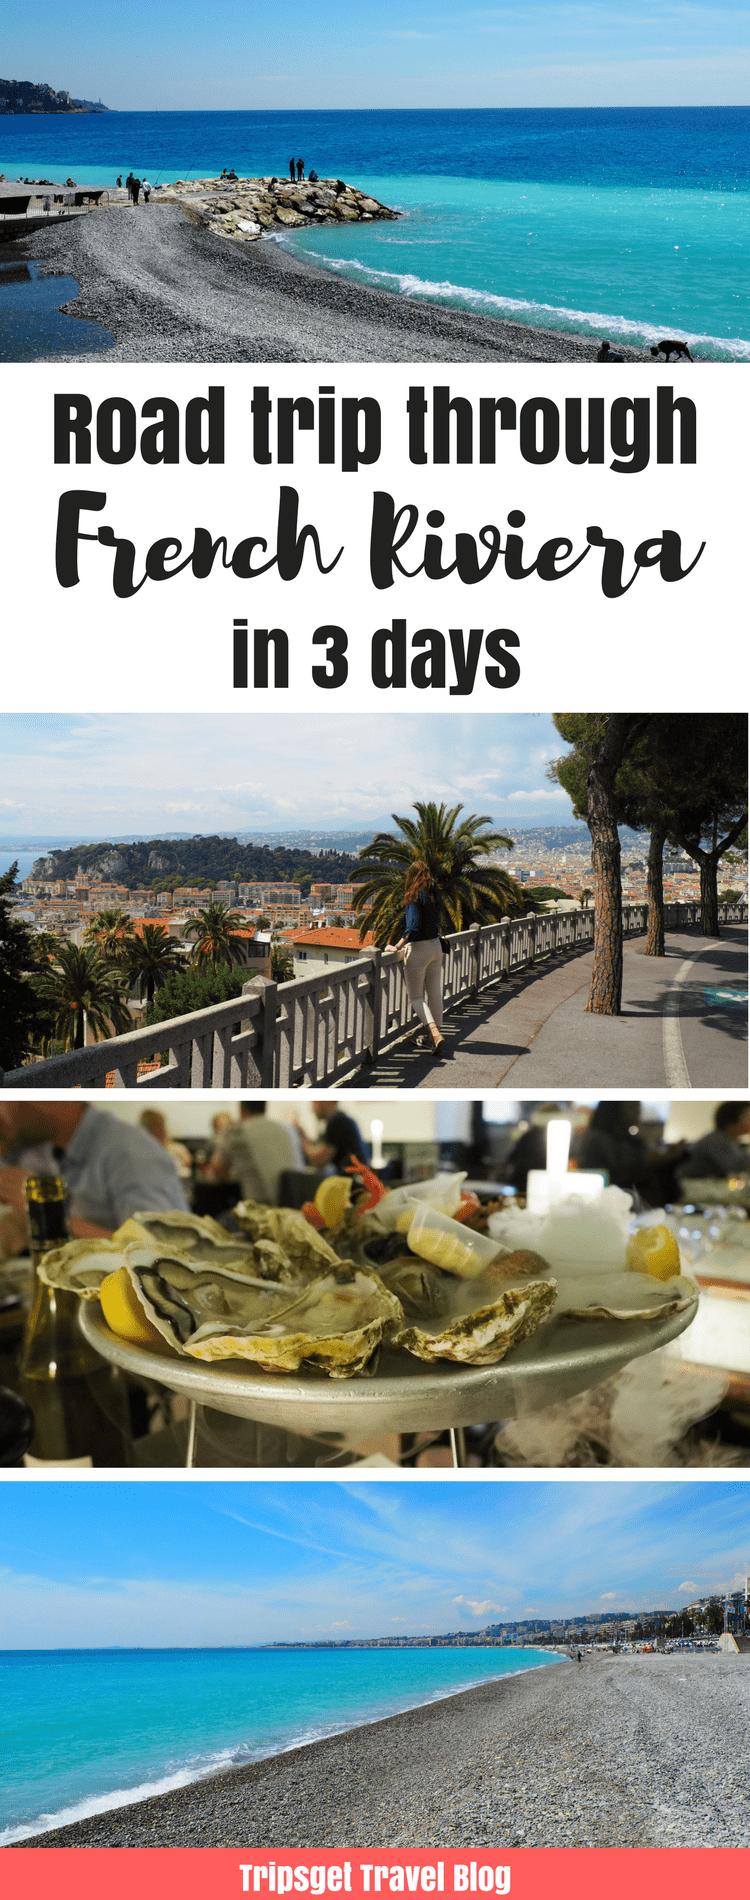 Road trip through Côte D'Azur in France, Road trip around French Riviera: Nice, Cannes, St. Paul de Vence, St. Tropez, Monaco